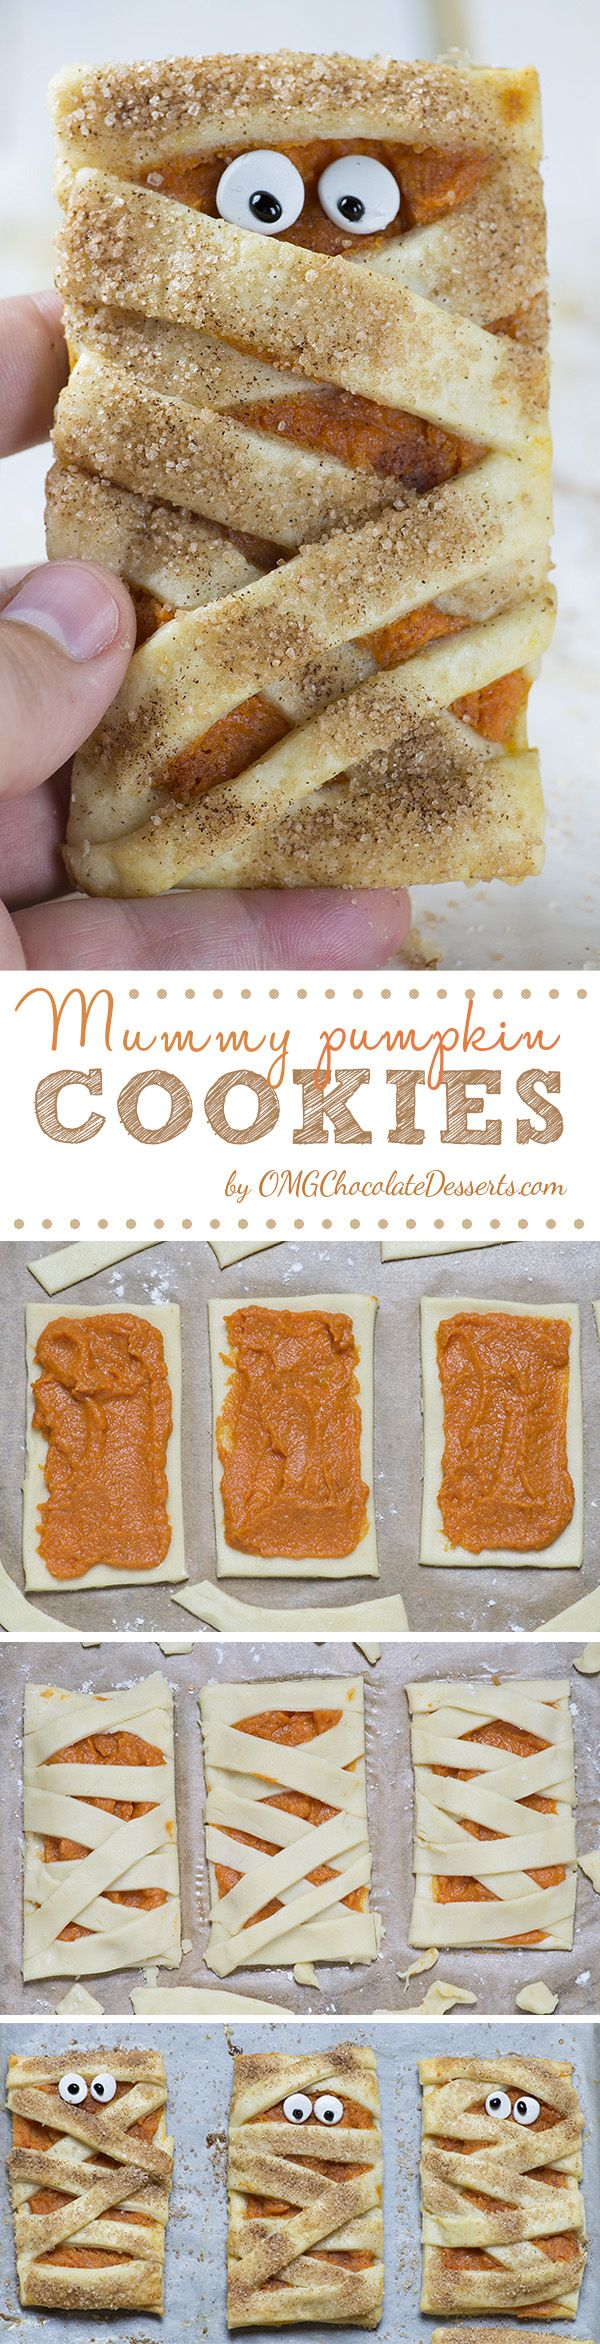 Mummy Pumpkin Cookies | Recipe